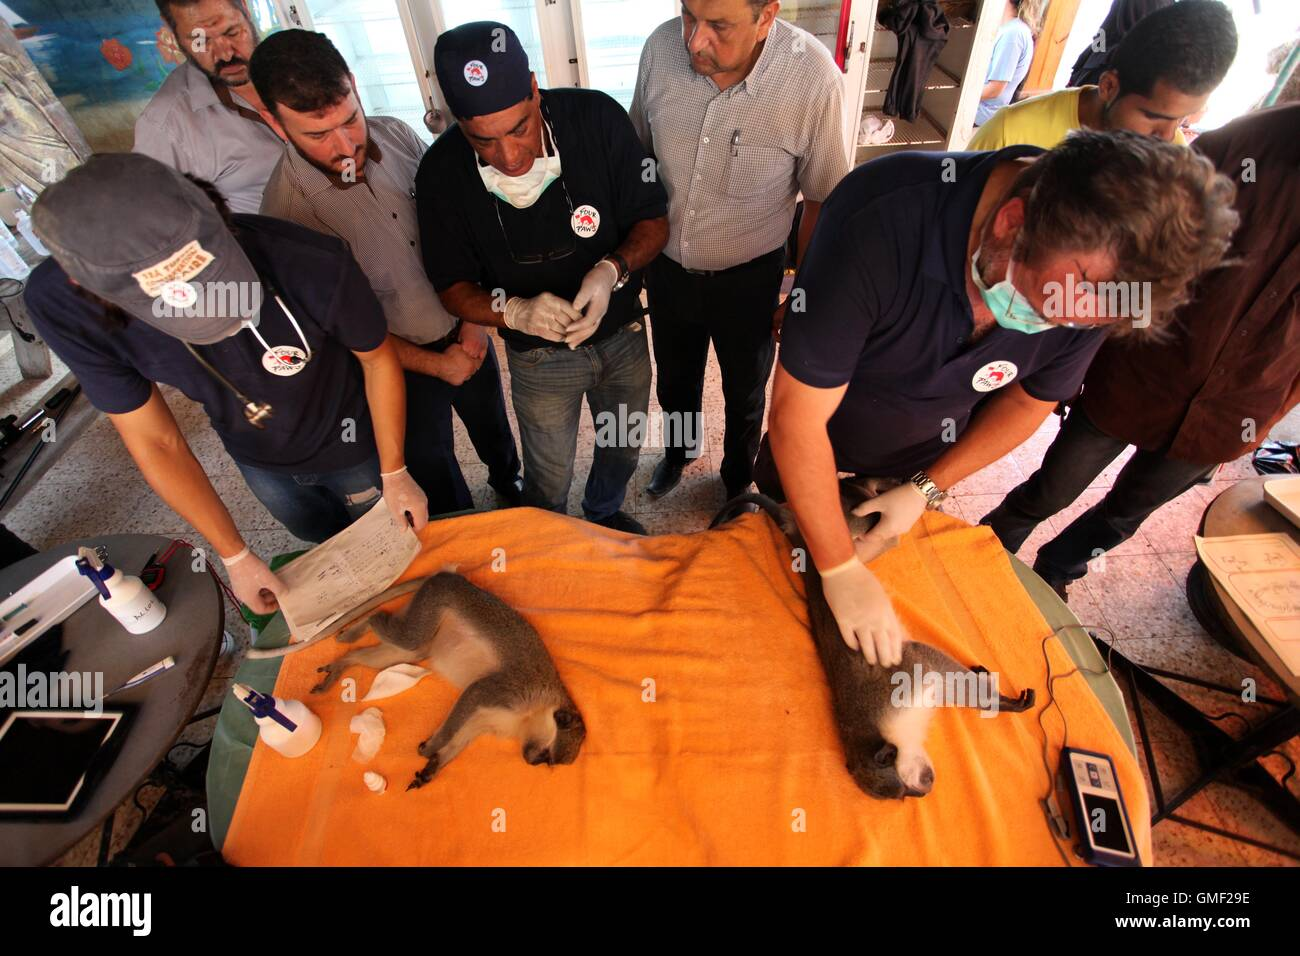 Khan Yunis, Gaza Strip, Palestinian Territory. 23rd Aug, 2016. Members of the international animal welfare charity - Stock Image